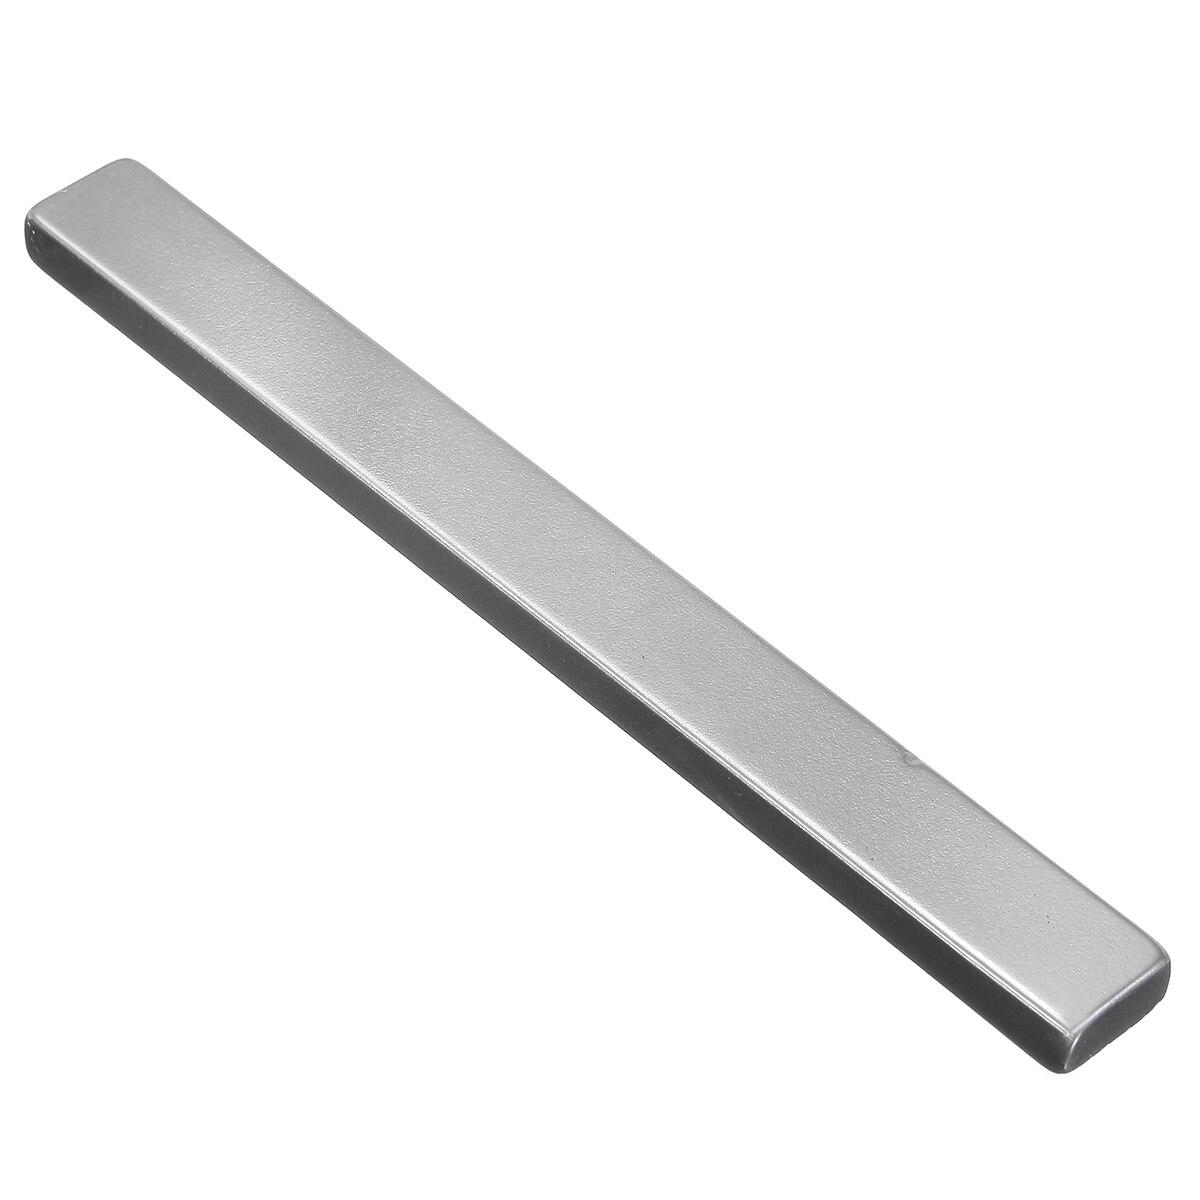 2pcs Magnet 60mm x 10mm x 5mm Strong Strip Block Cuboid Rare Earth Neodymium N50